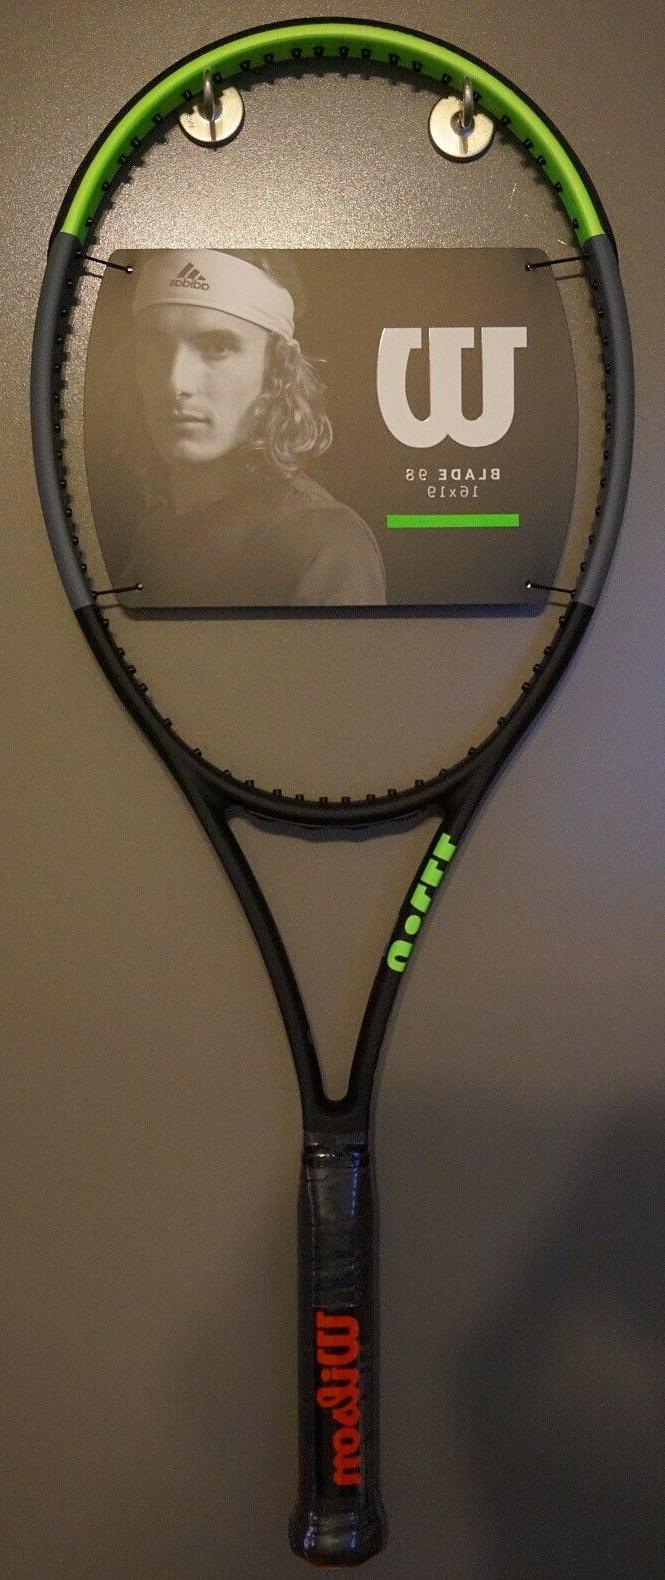 new blade 98 16x19 v7 tennis racket